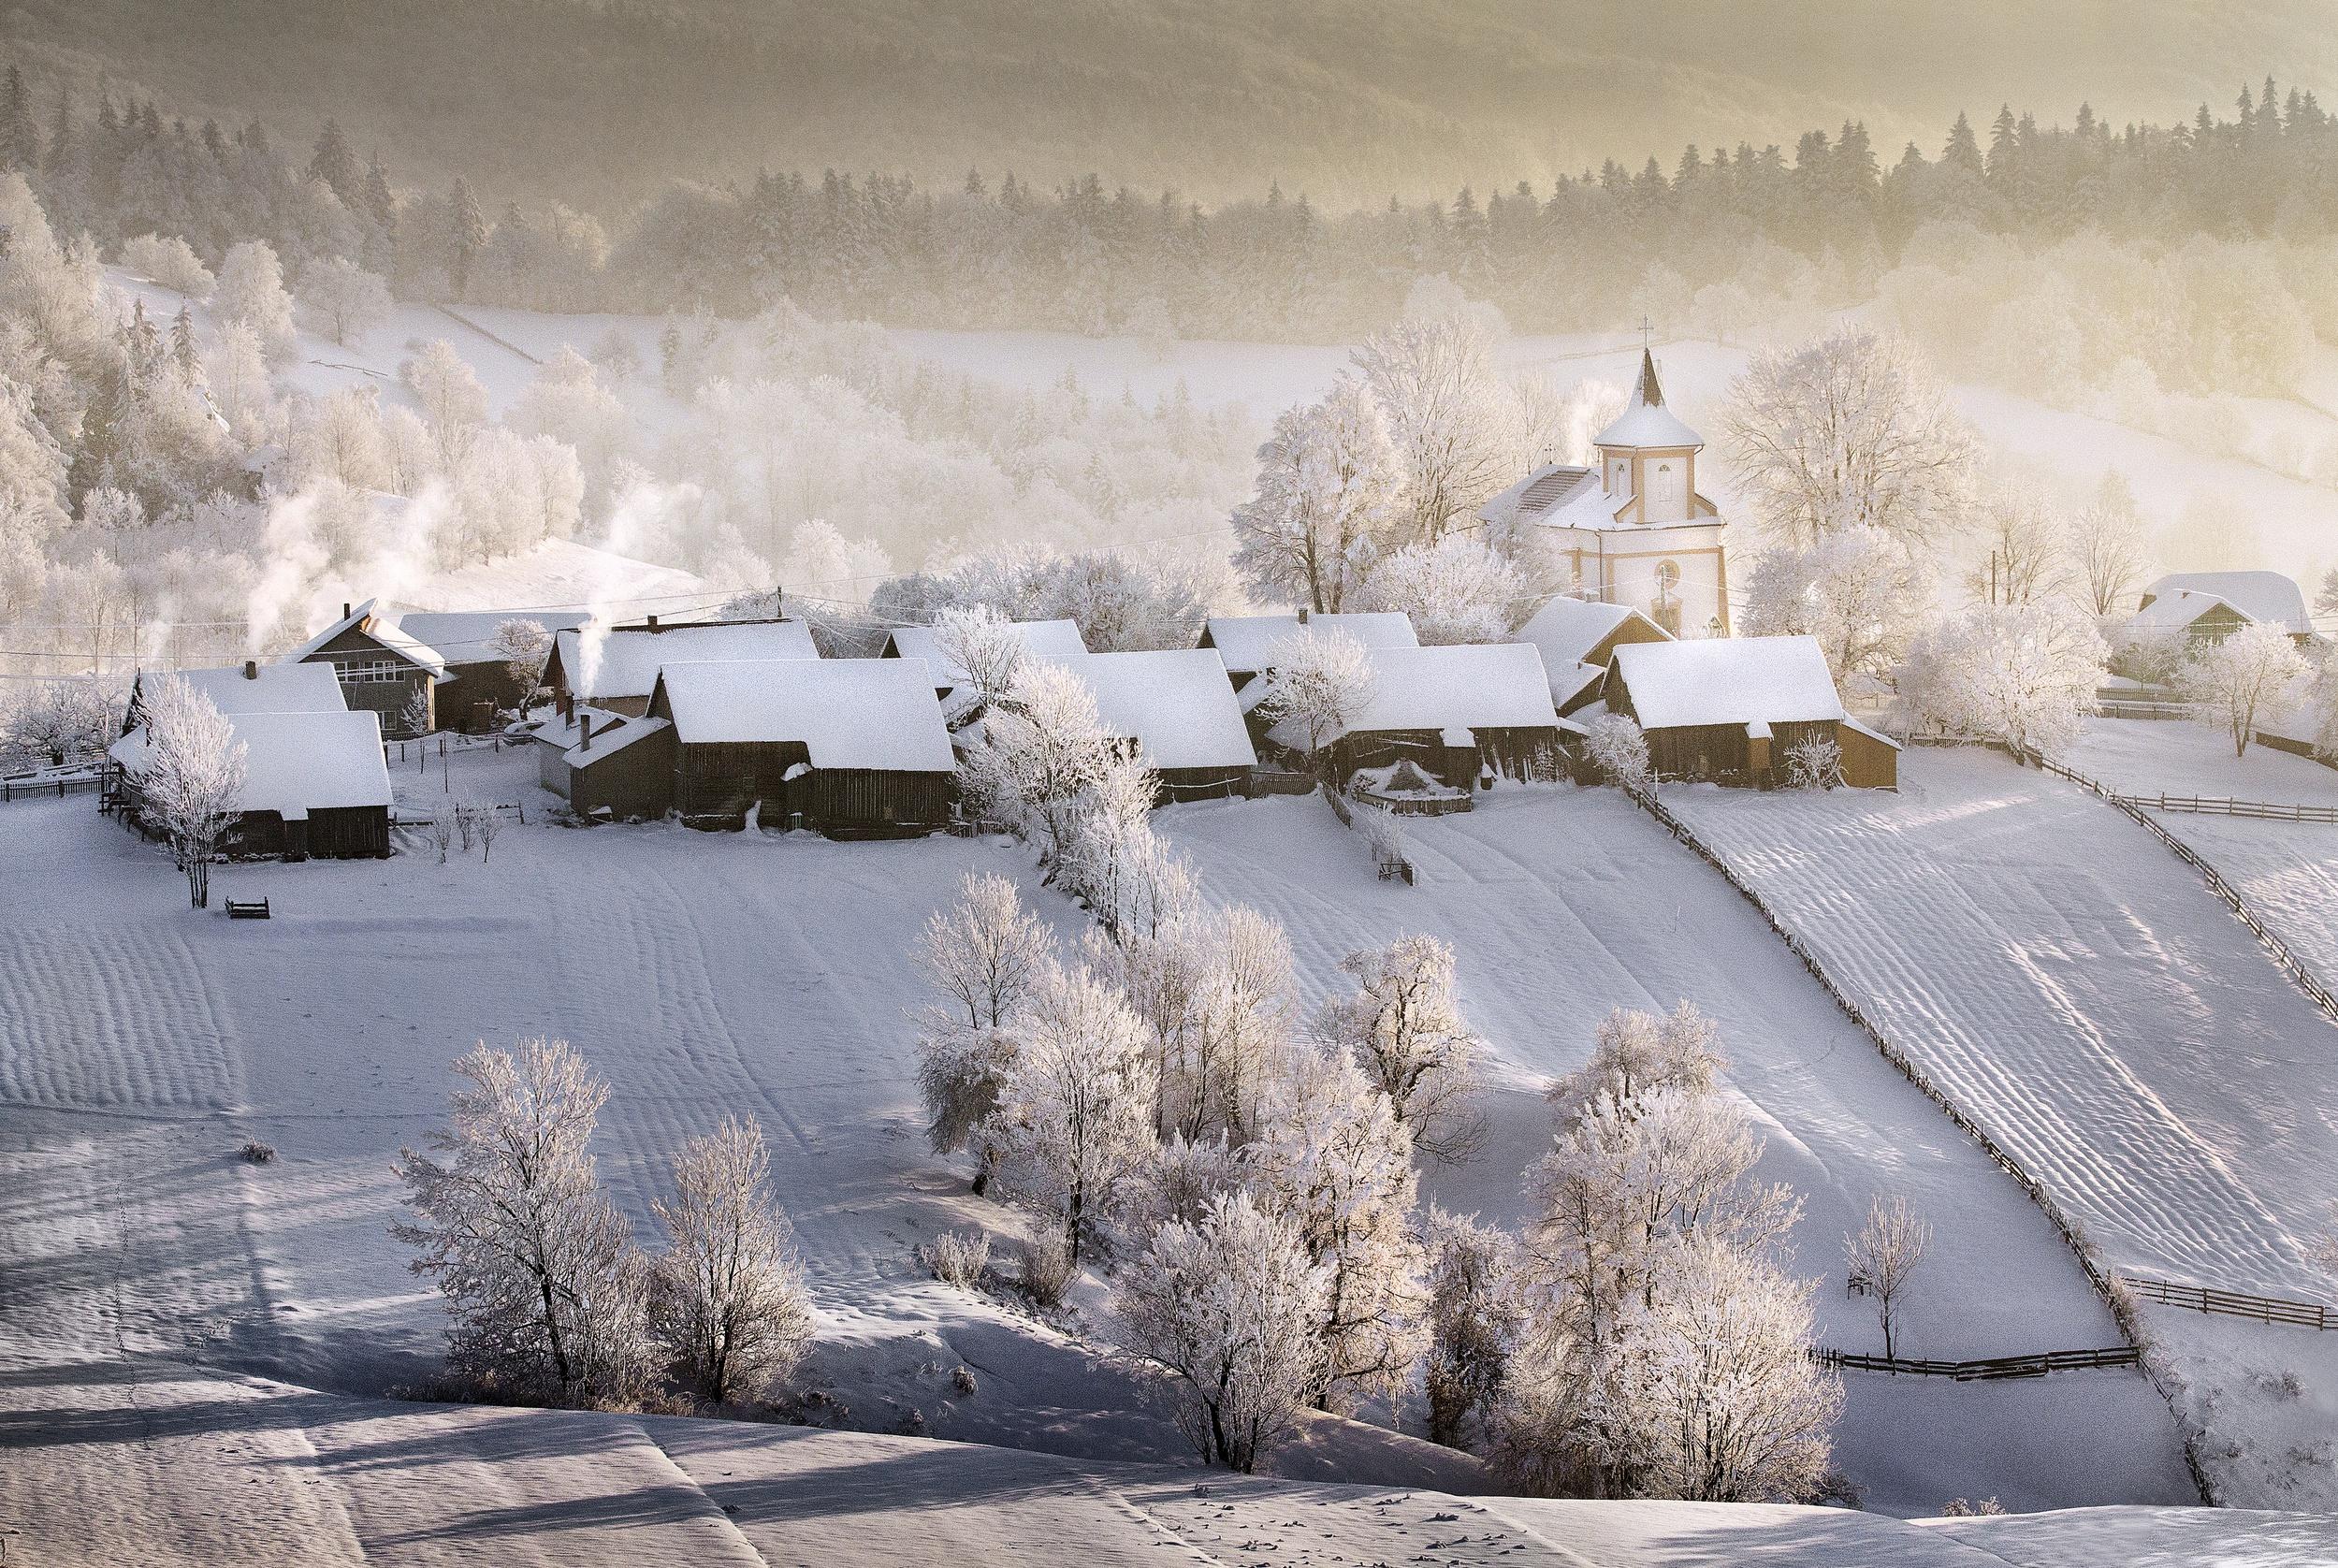 Обои на рабочий стол деревня зимой